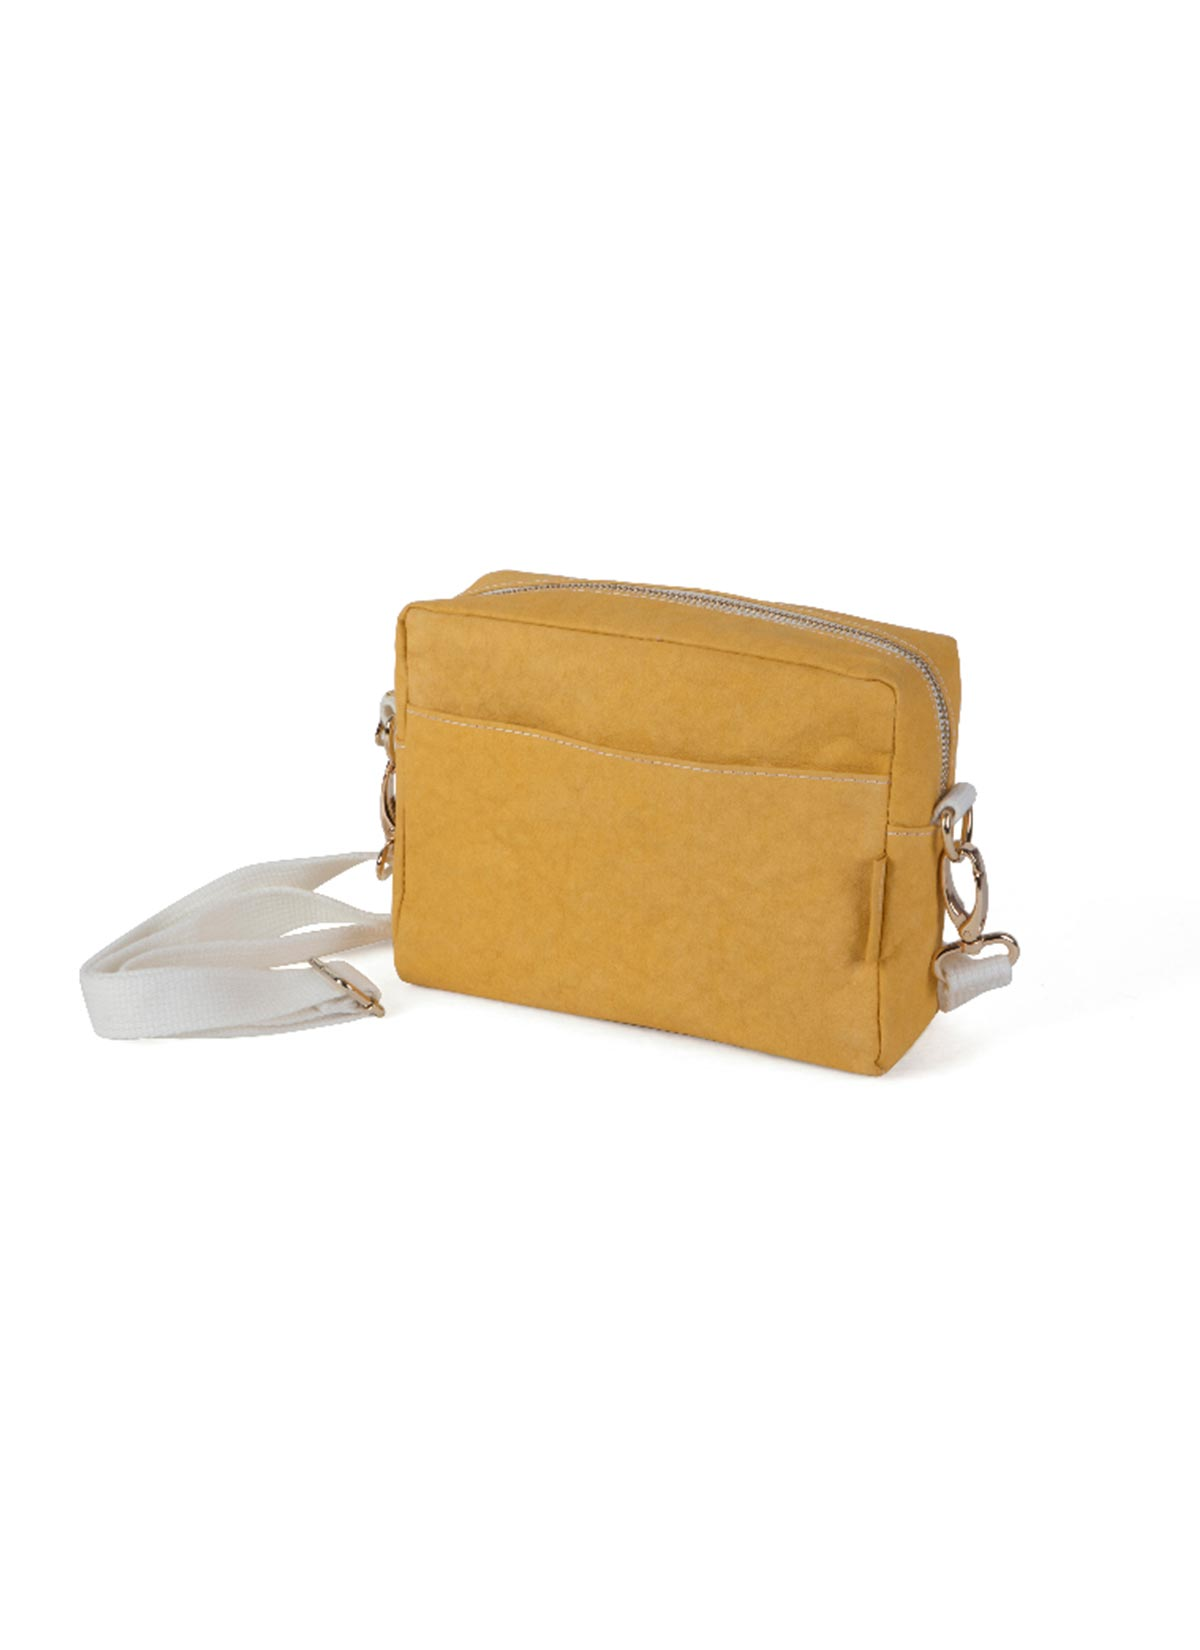 It Bag Mustard